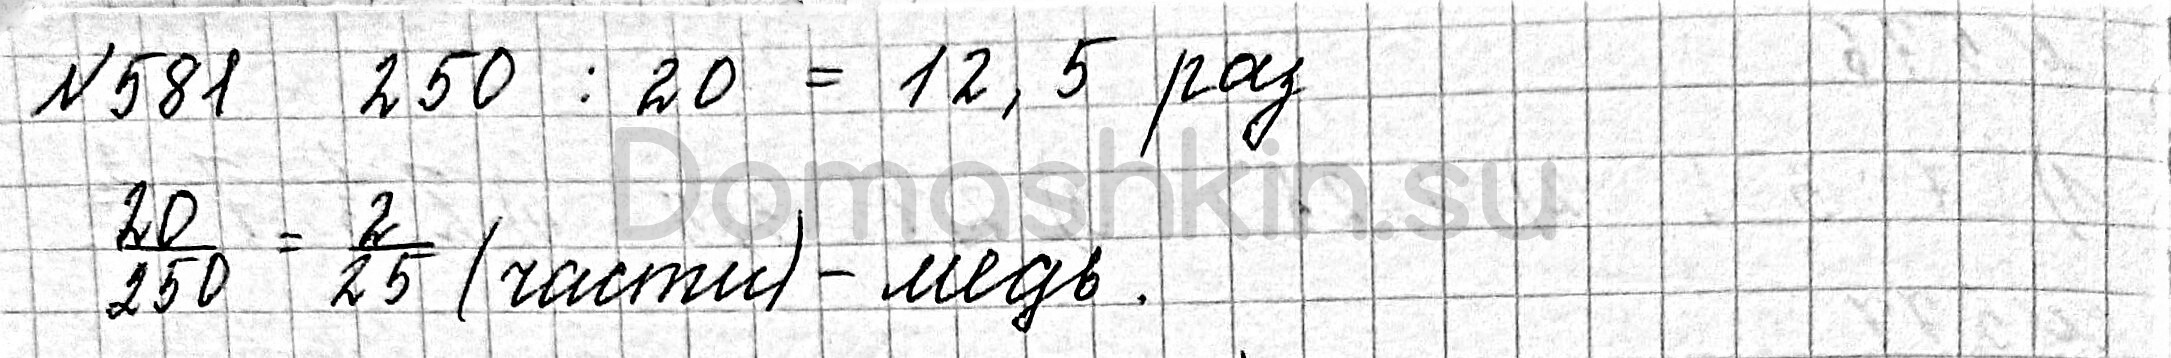 Математика 6 класс учебник Мерзляк номер 581 решение